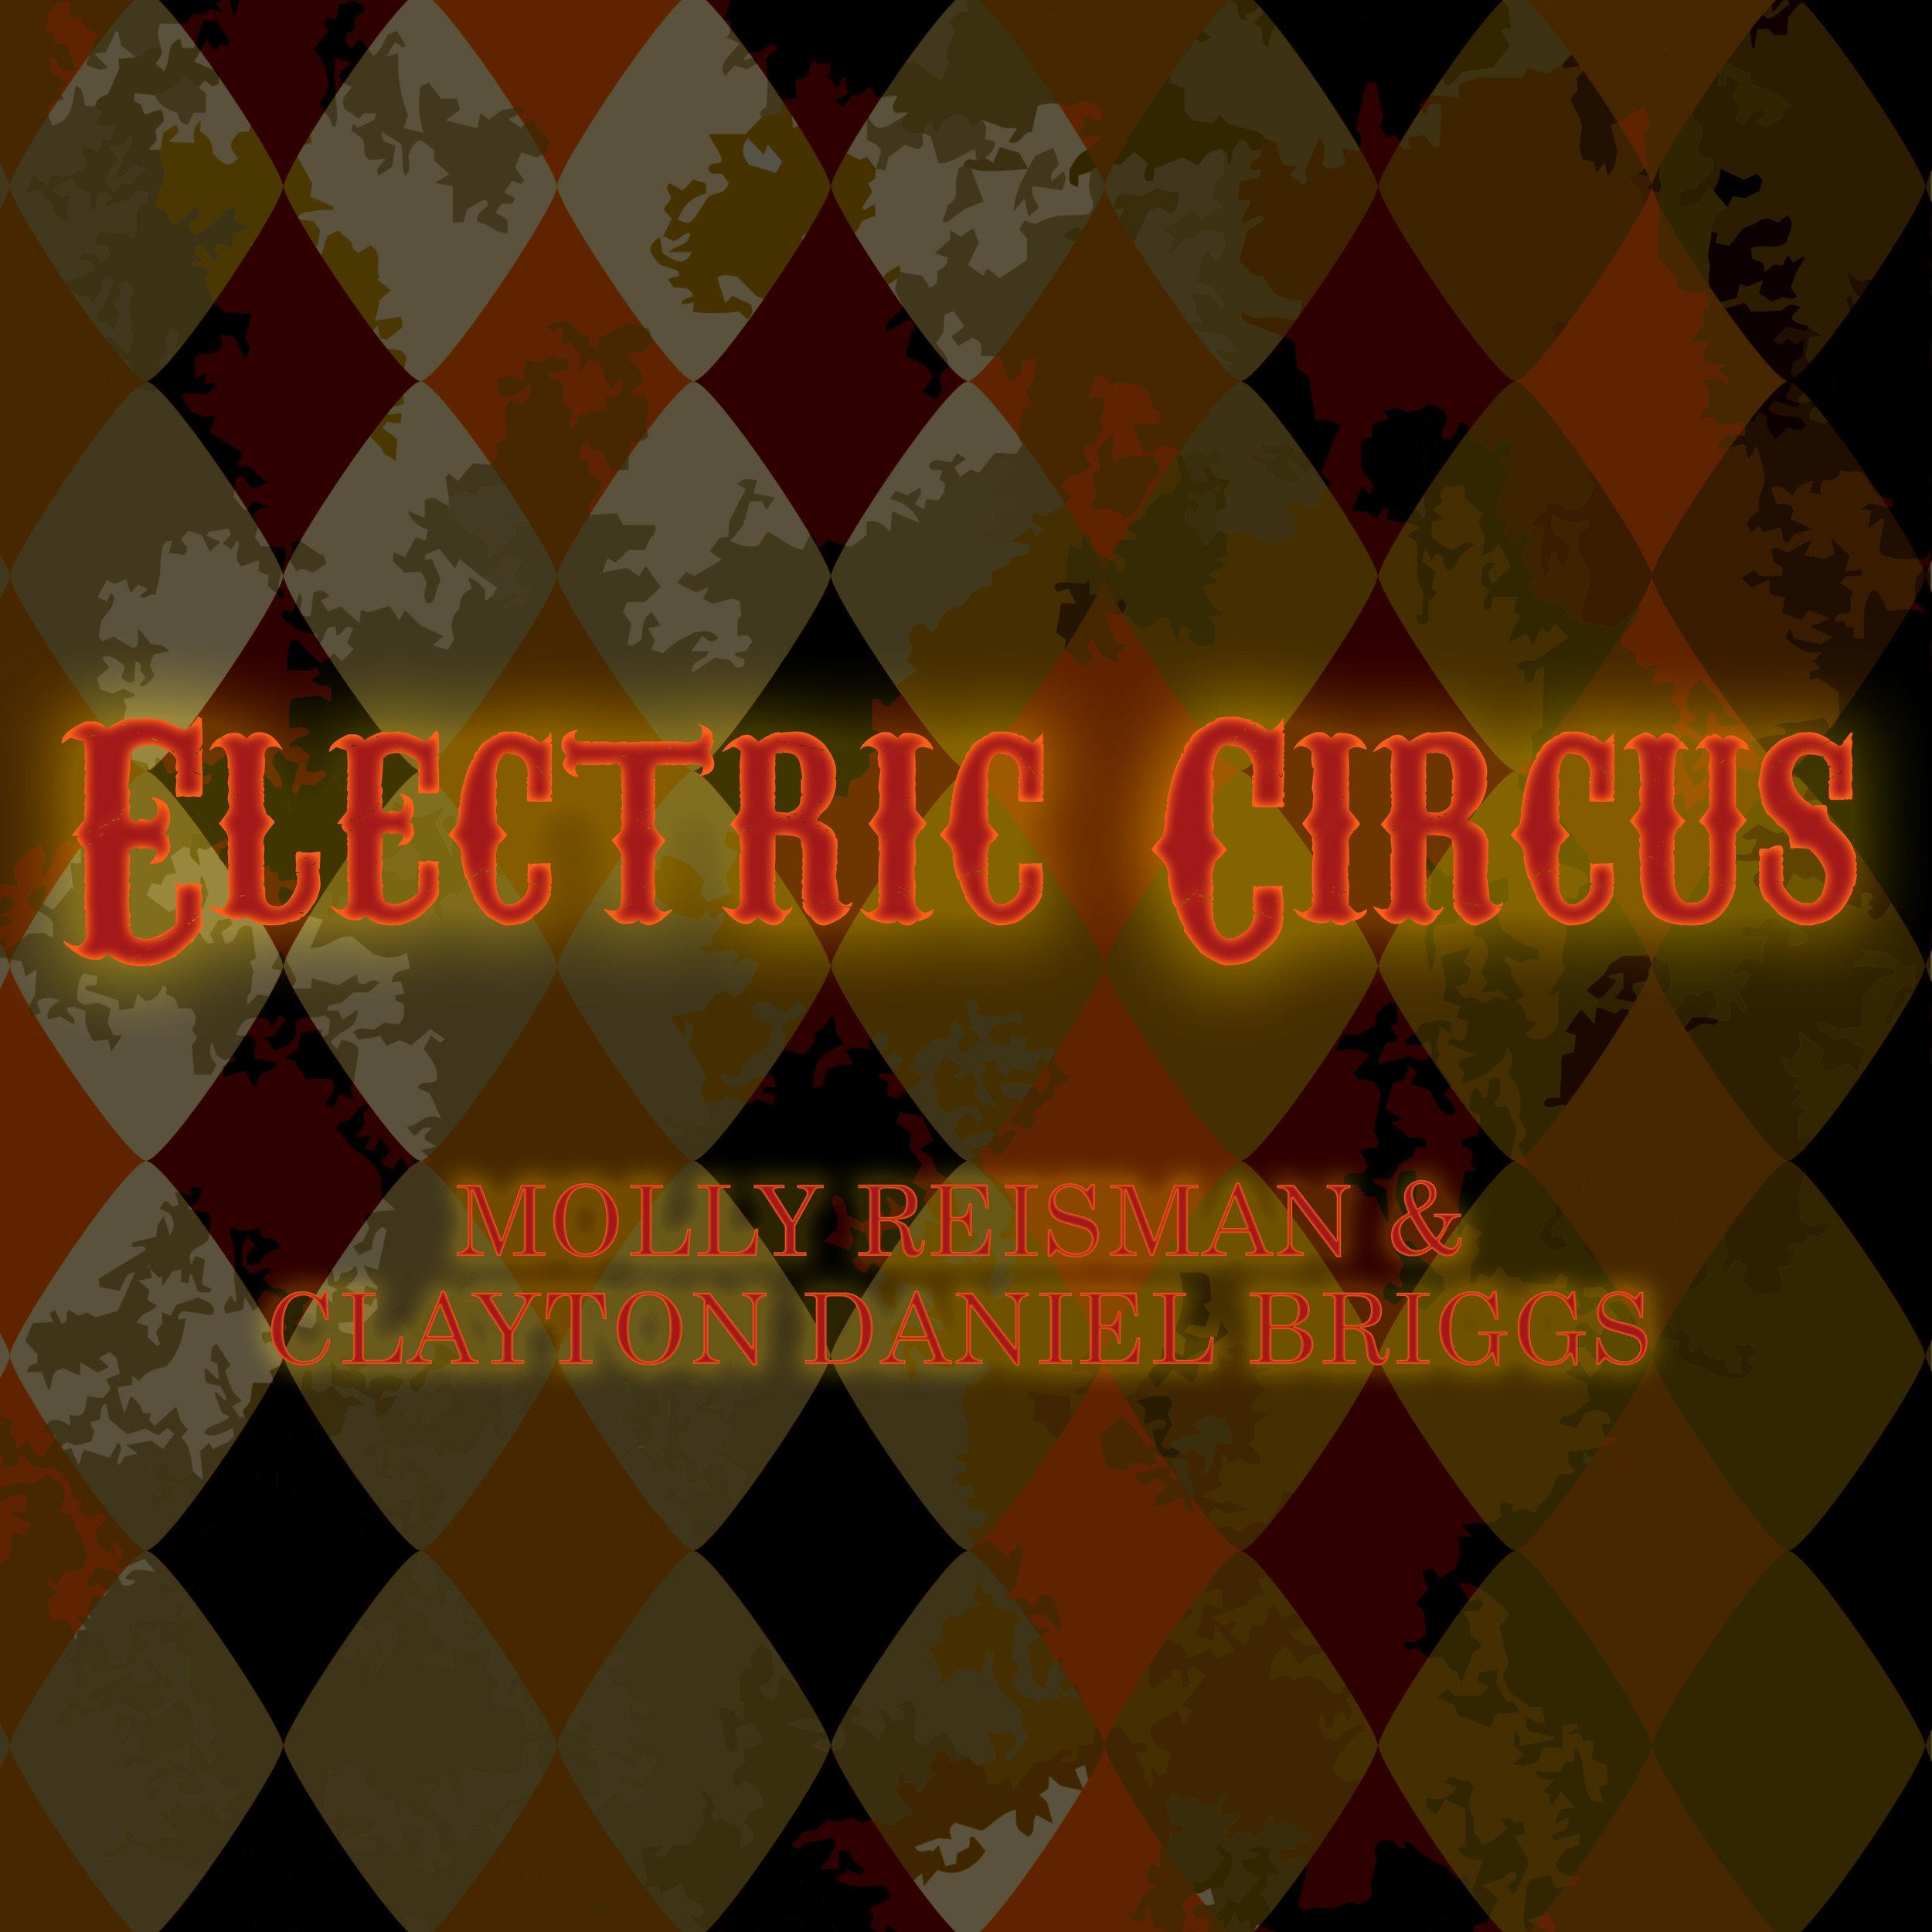 Electric Circus Poster Square.jpg